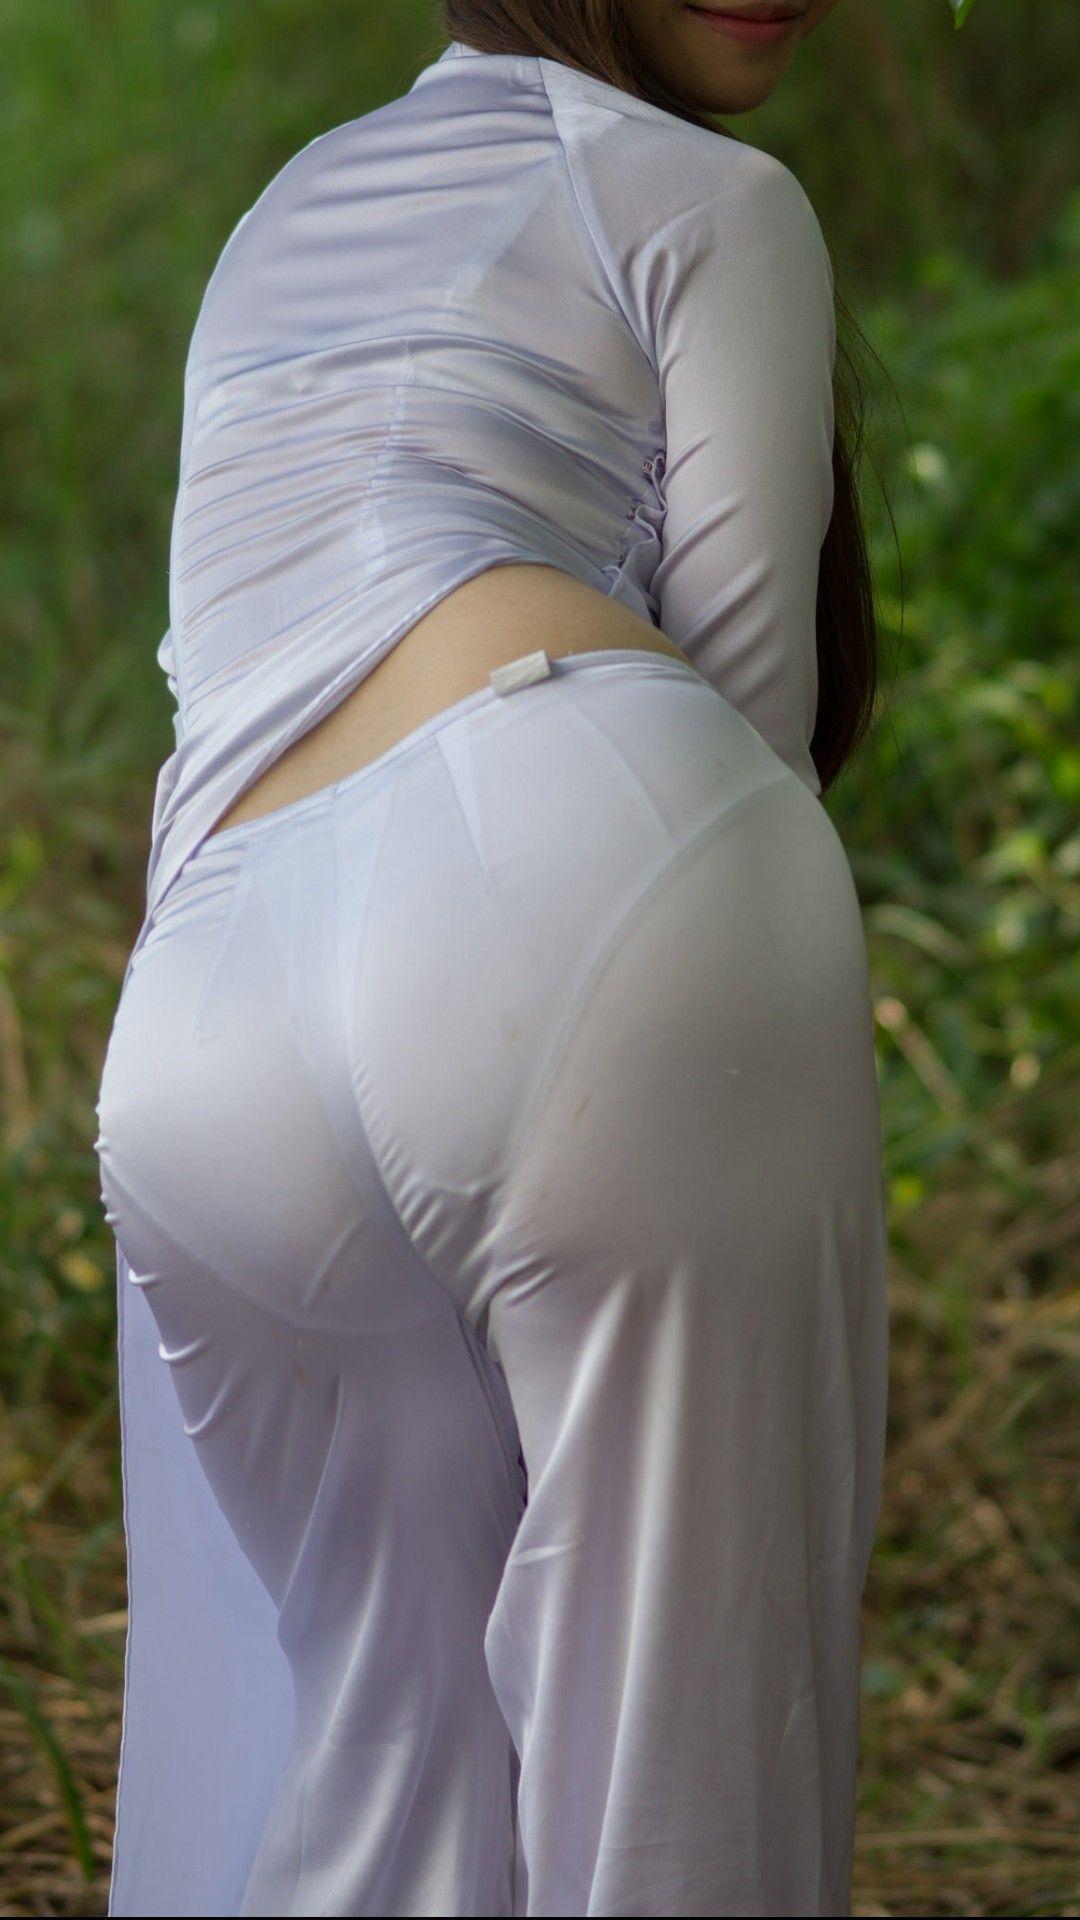 Ao dai girls sucking cock, my boobs picture